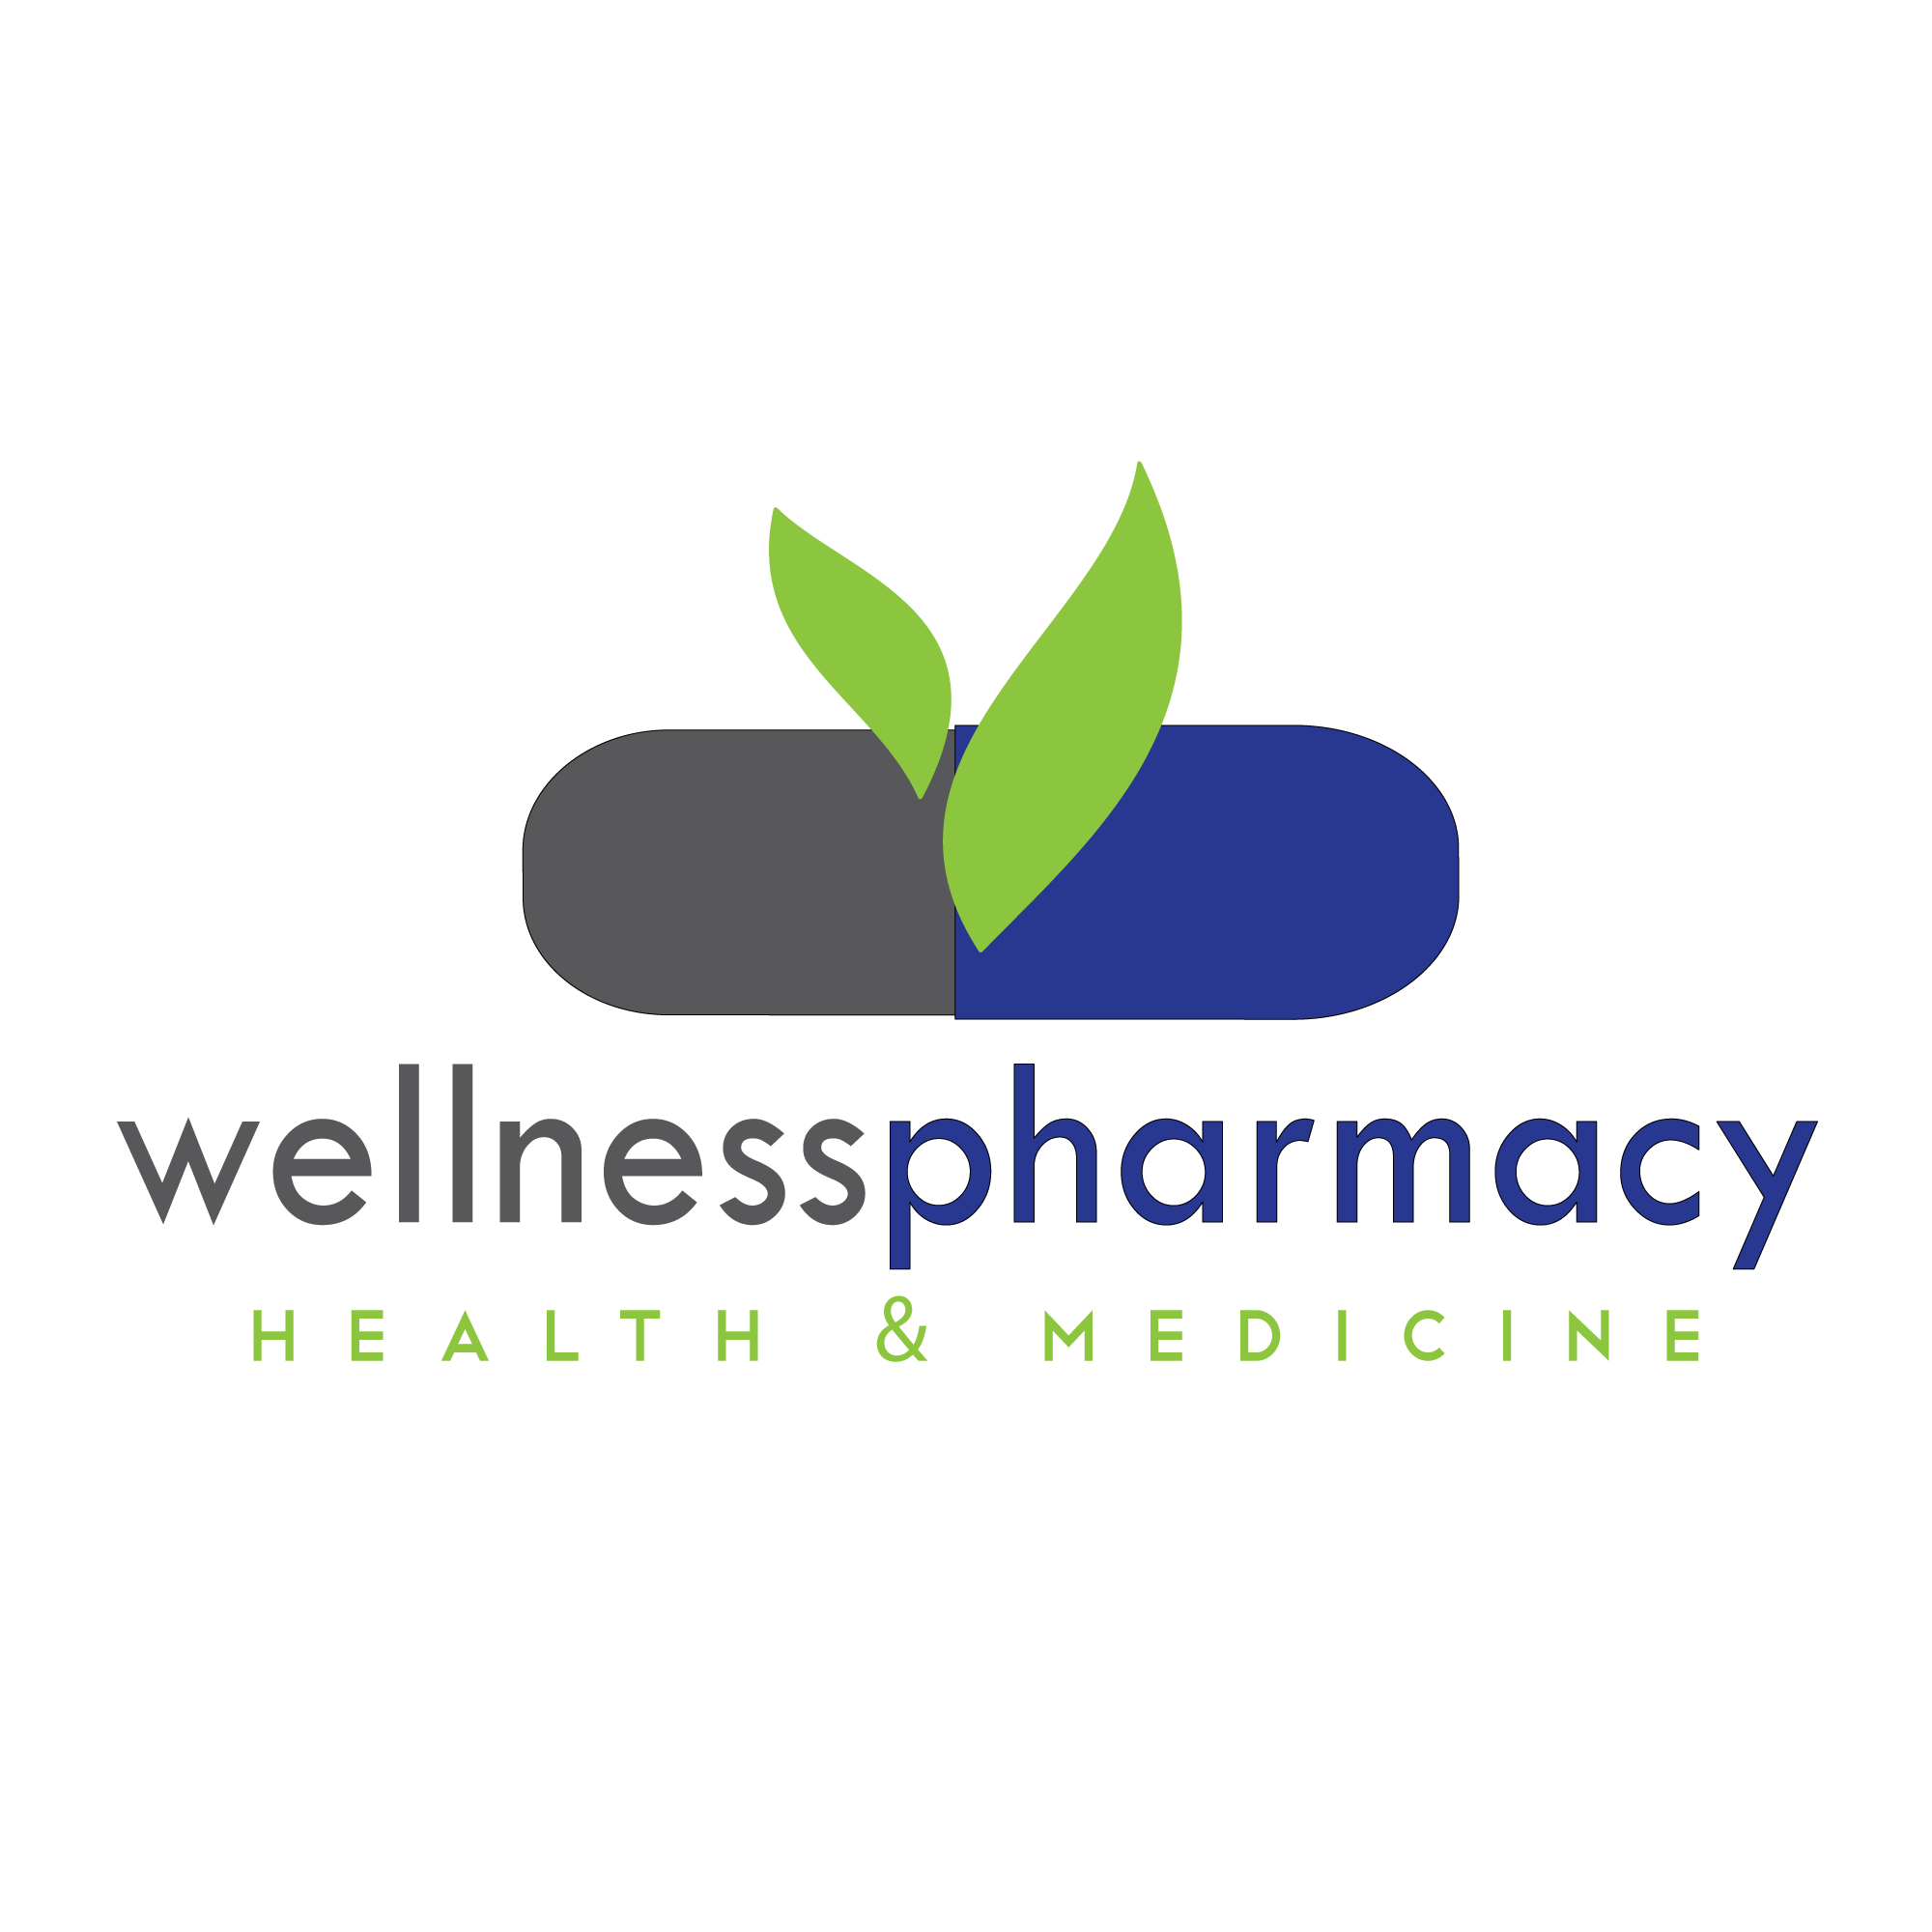 wellness pharmacy-01